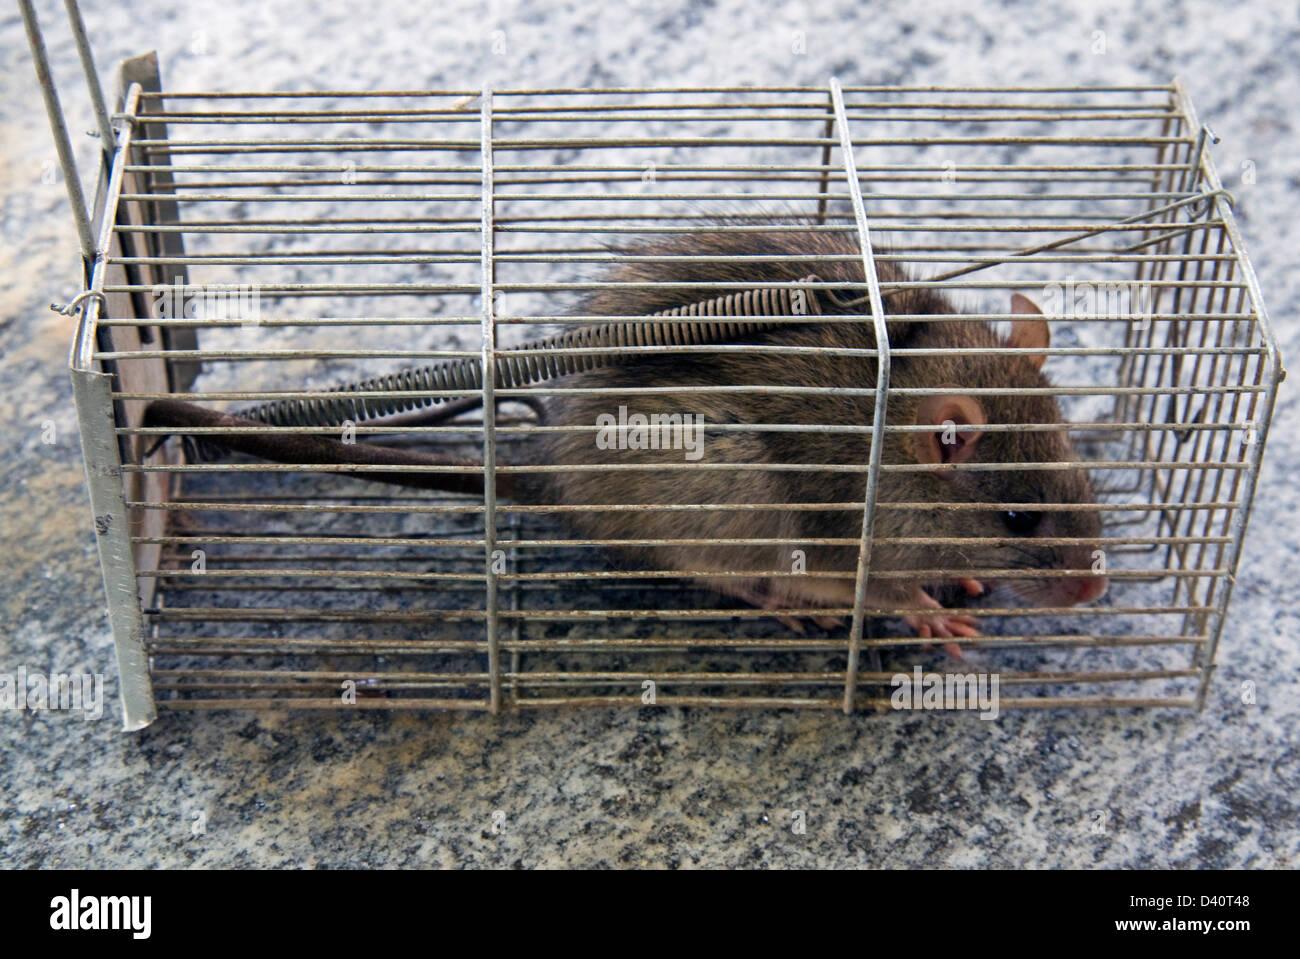 Brown rat, common rat, street rat, sewer rat, Hanover rat, Norway rat, brown Norway rat, Norwegian rat, or wharf - Stock Image